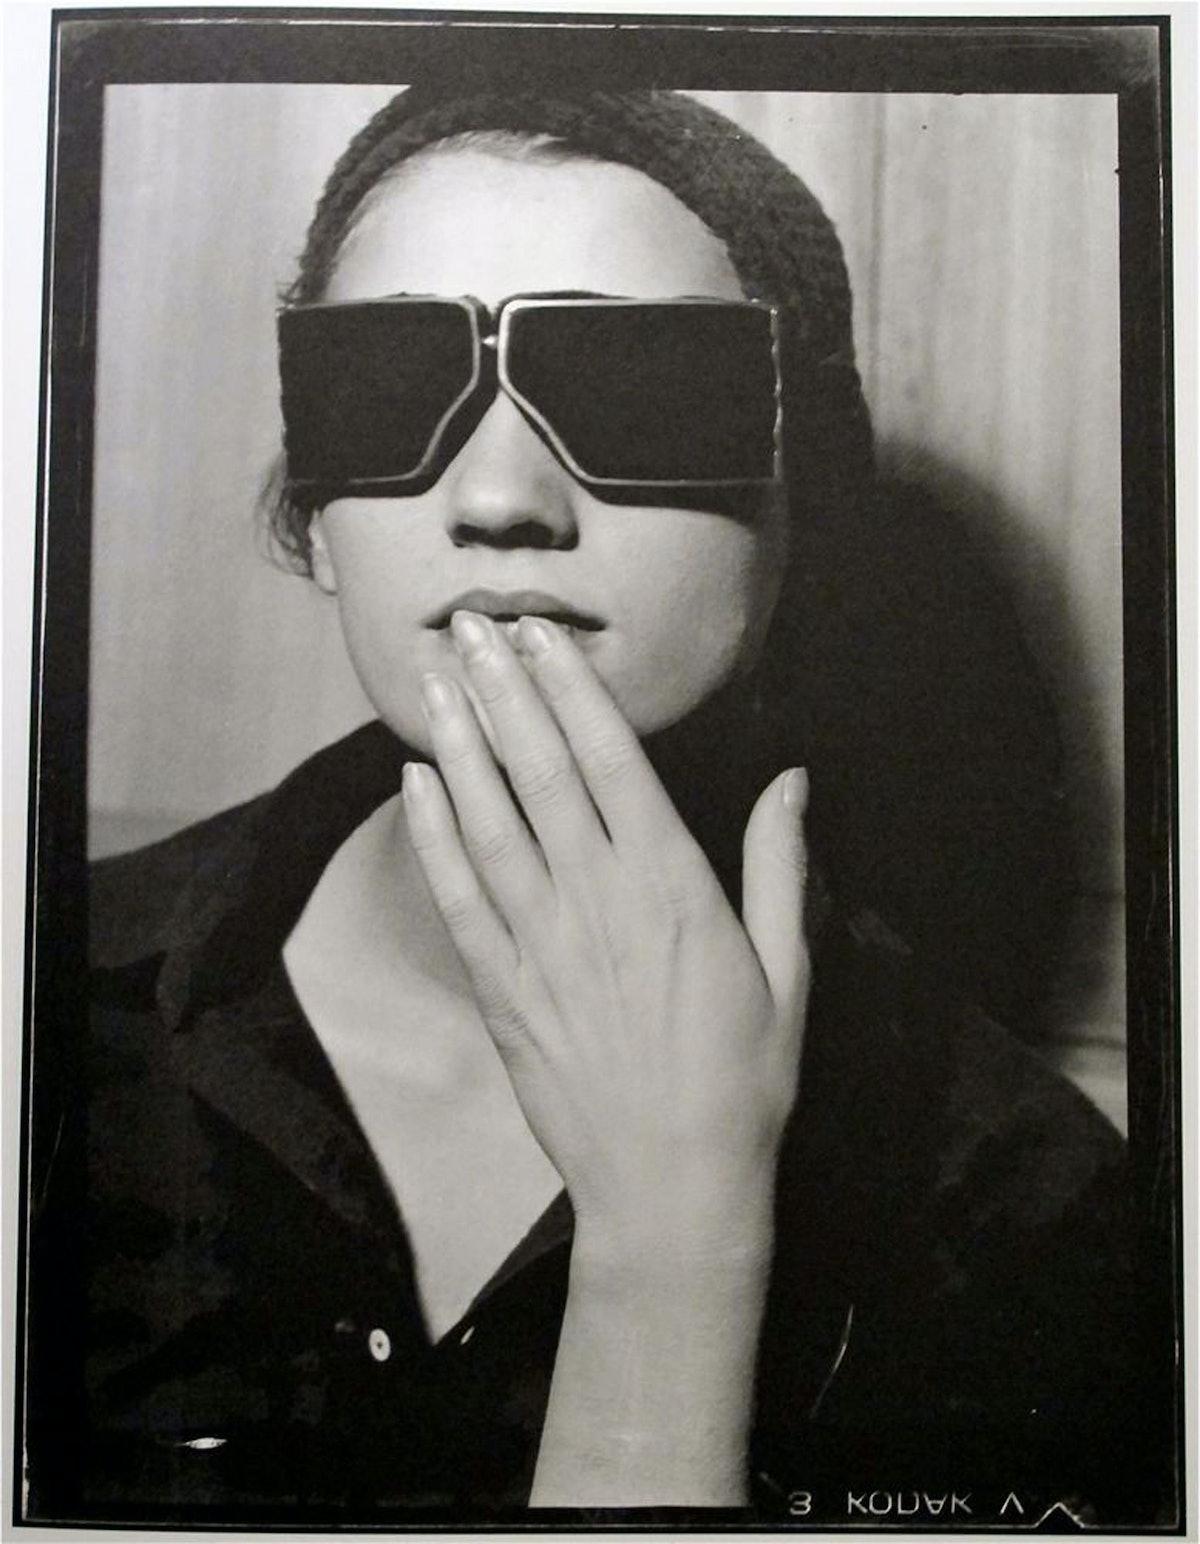 Man Ray's portrait of Lee Miller